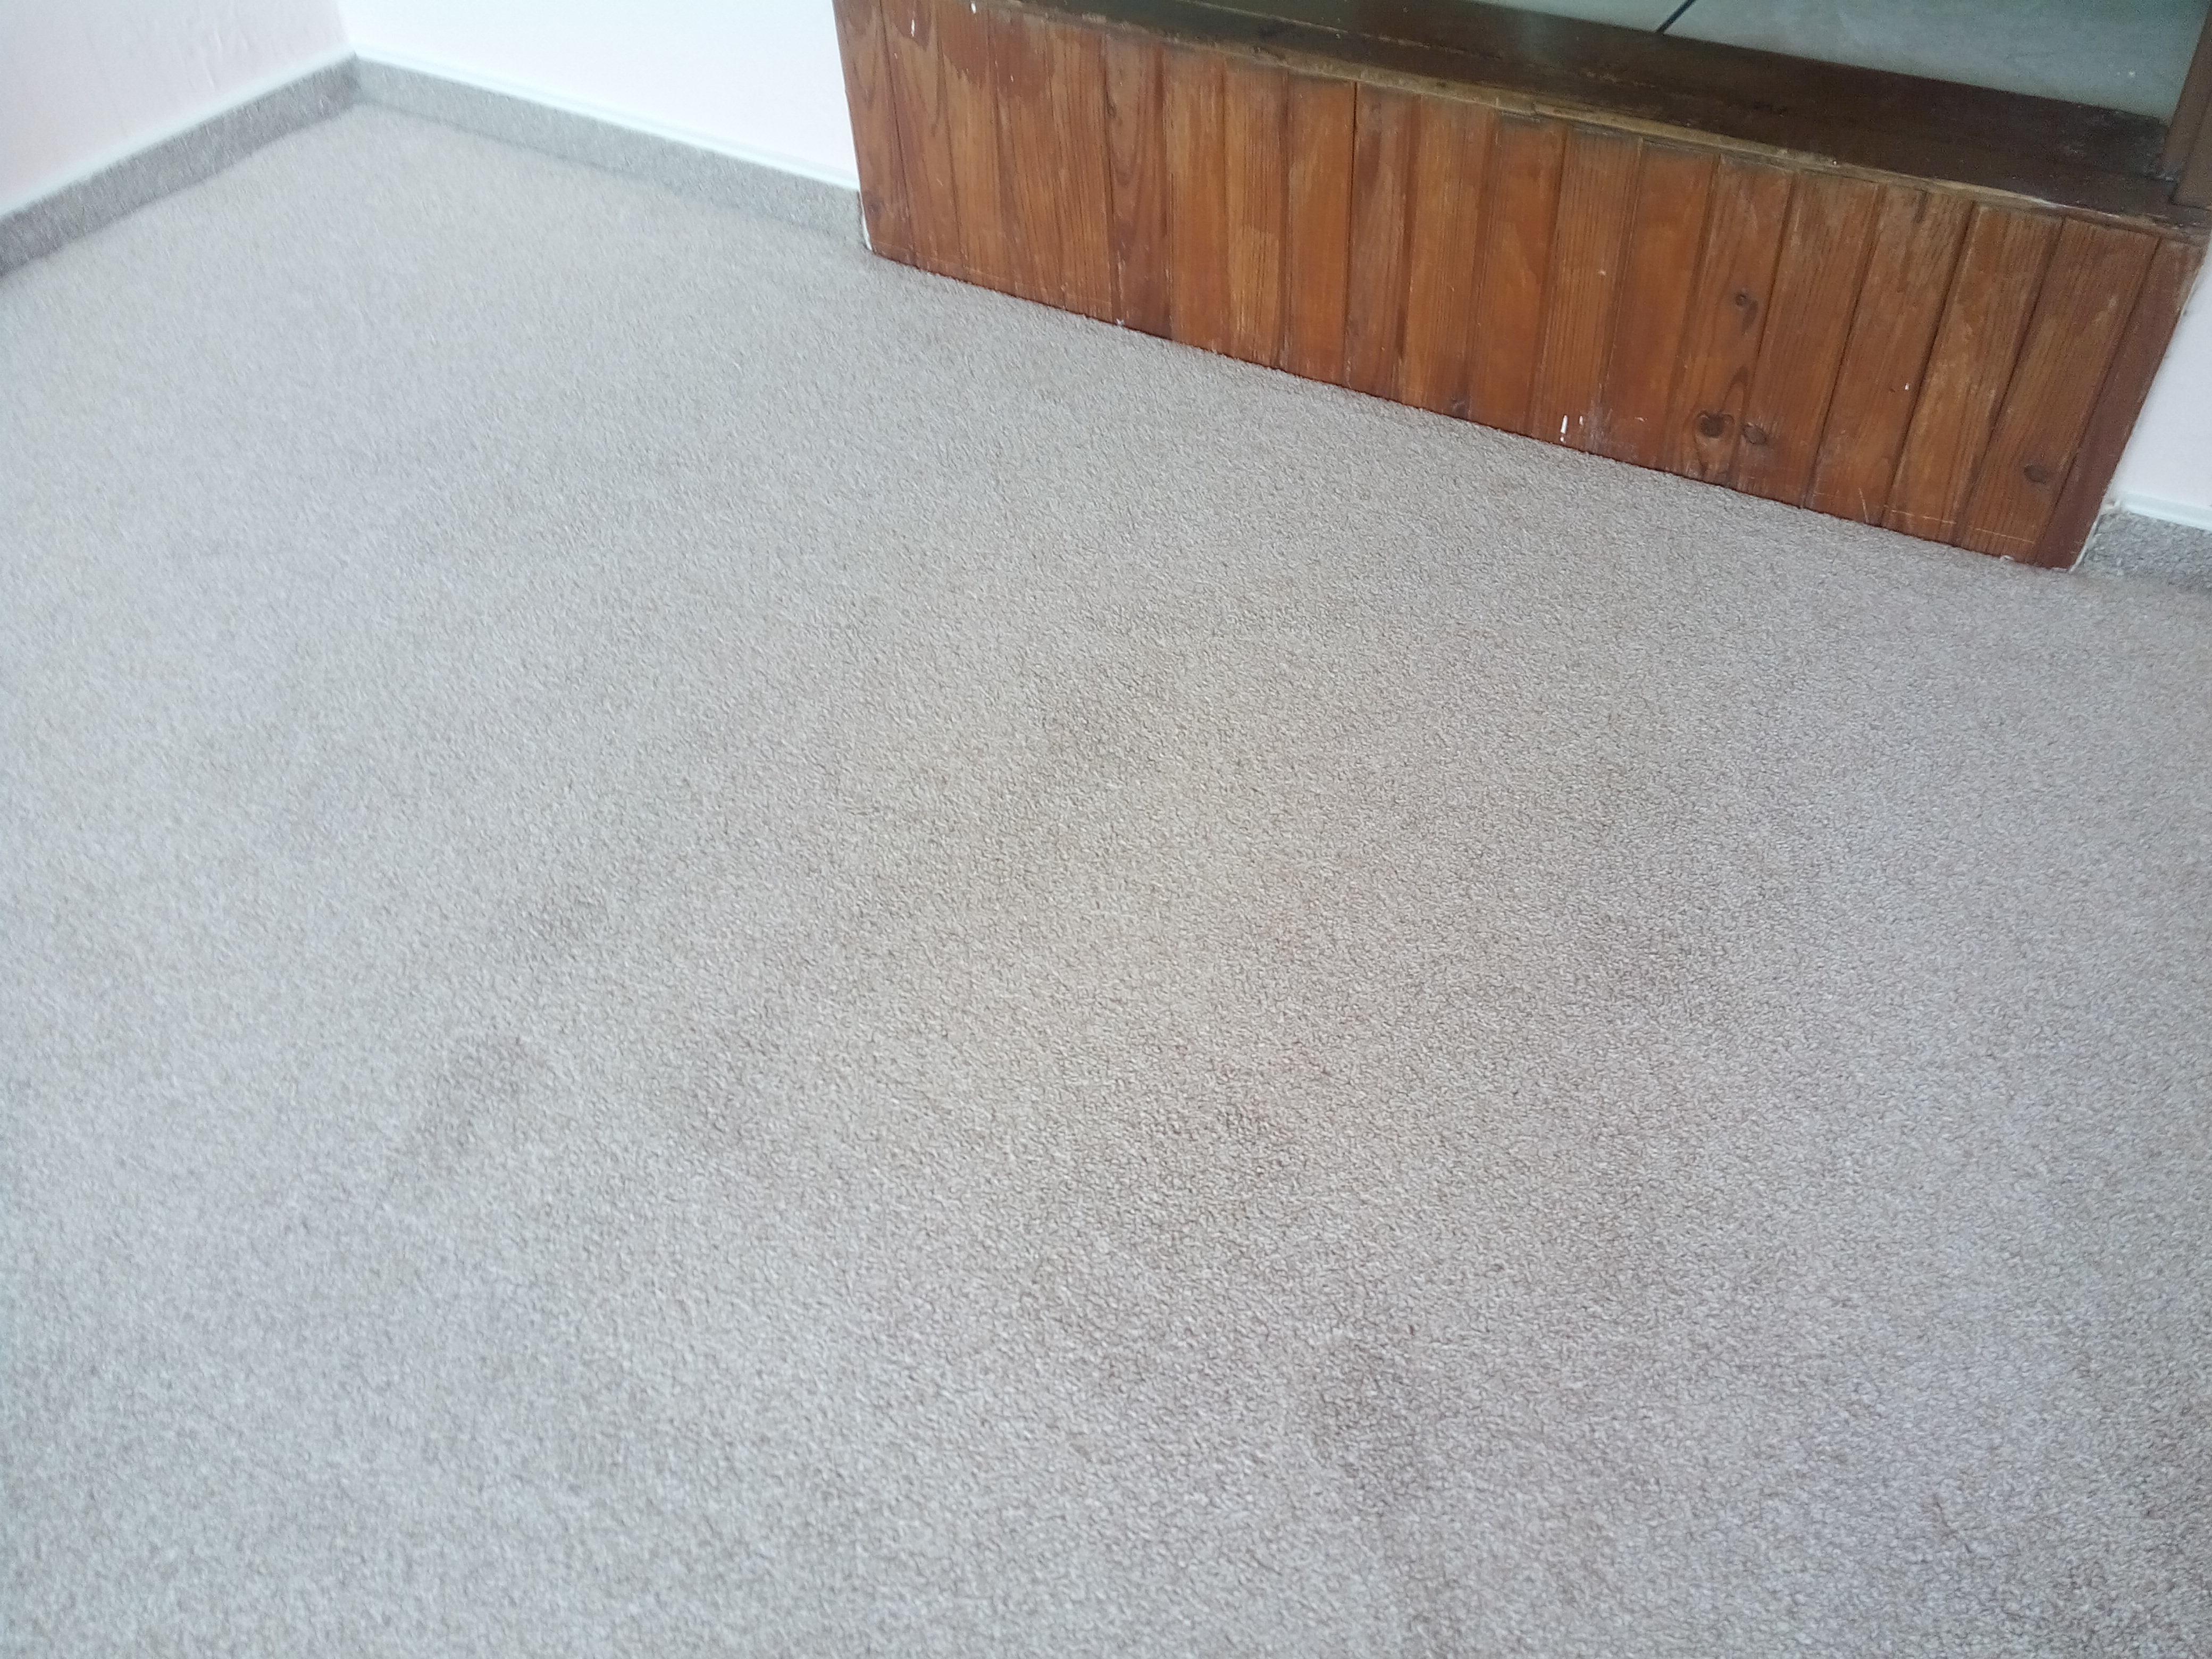 Desková úprava podkladu + napínaný koberec